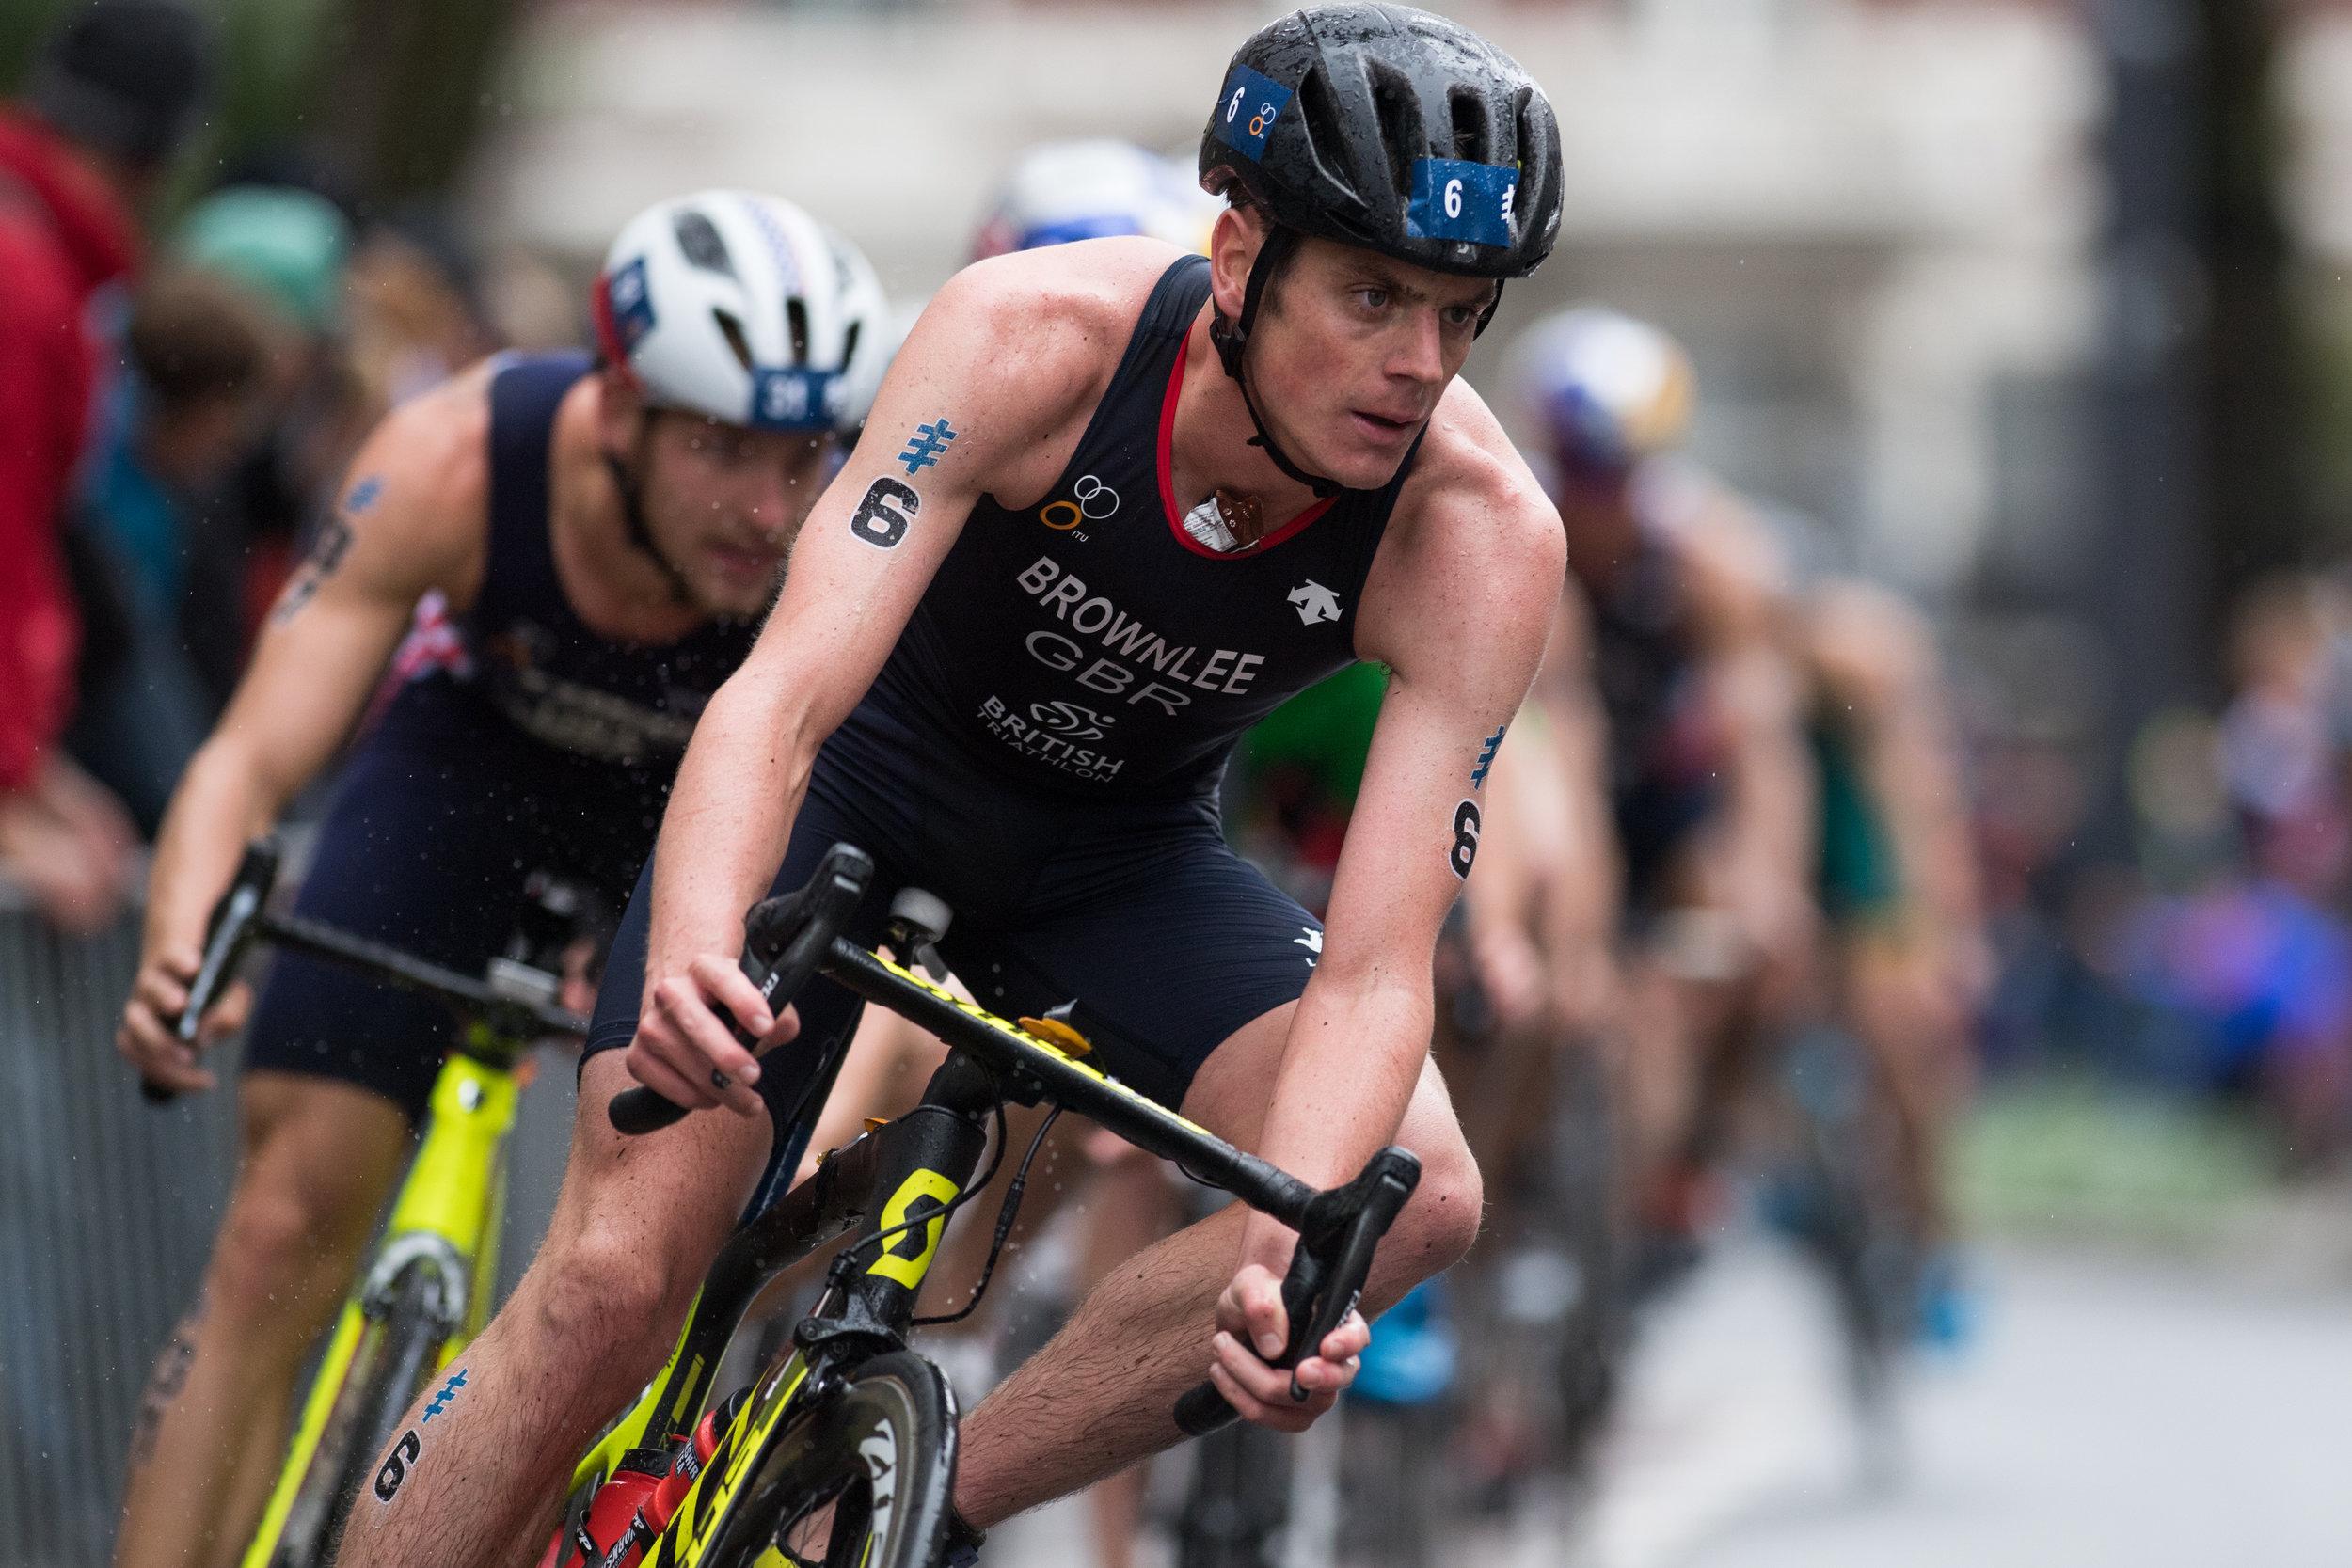 CREDIT- photographer:British Triathlon